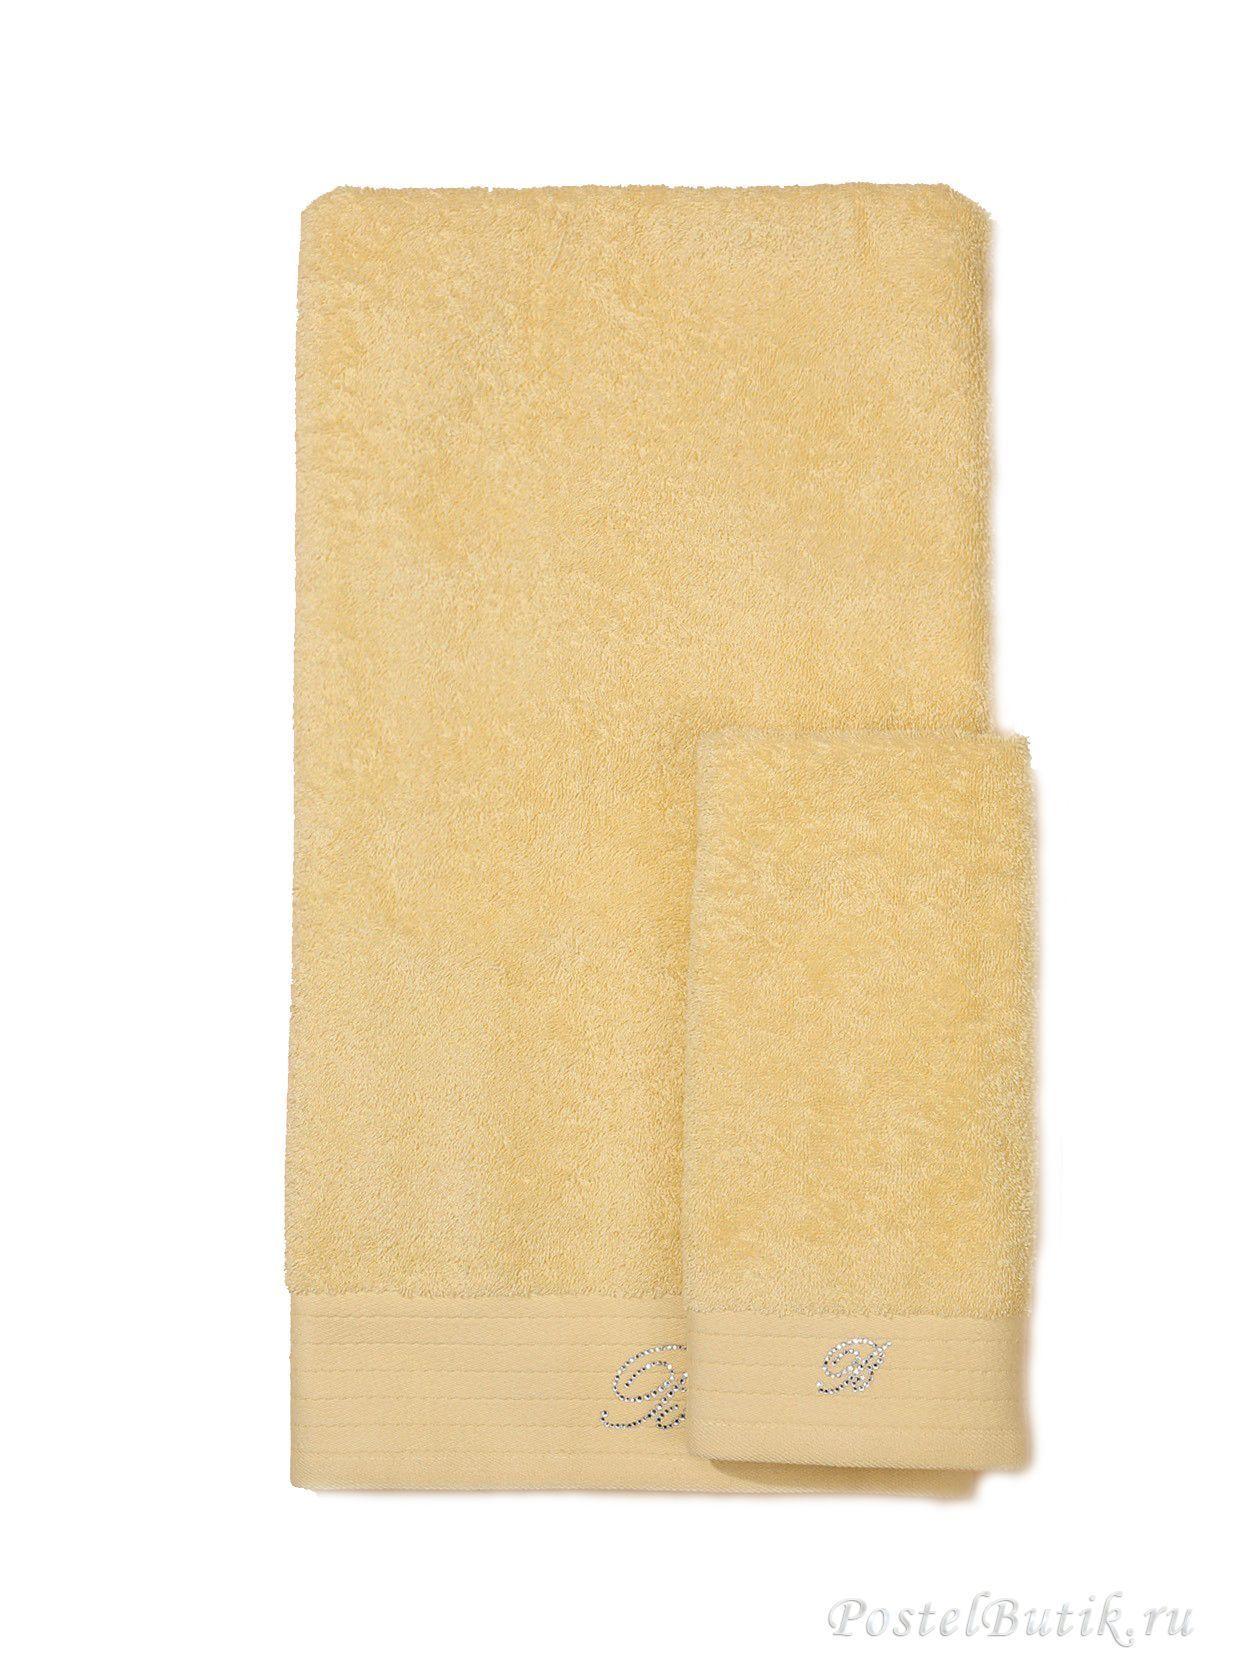 Наборы полотенец Набор полотенец 5 шт Blumarine Crociera желтый elitnie-polotentsa-crociera-zheltie-ot-blumarine-italiya-komplekt.jpg